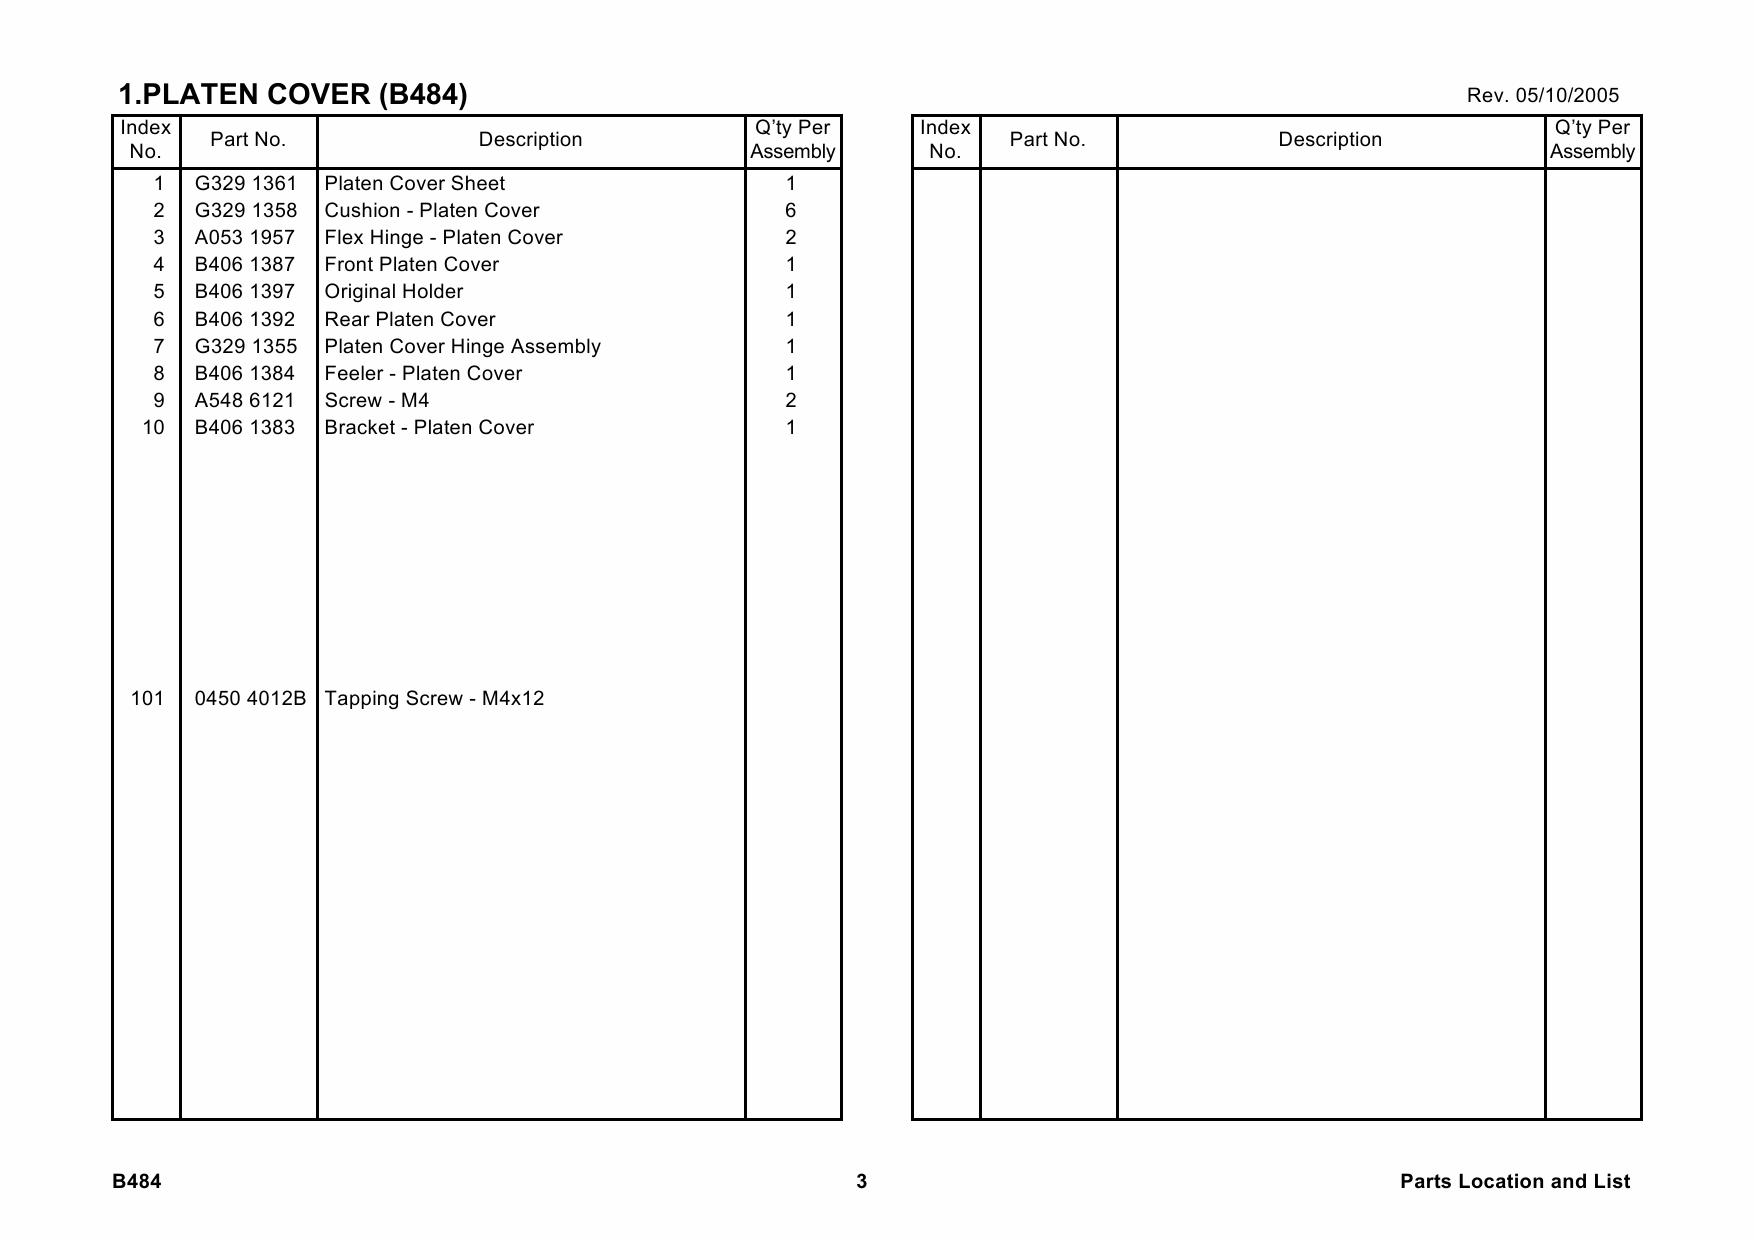 ricoh options b484 platen cover type 120 parts catalog pdf download Retrevo Manuals Program Manual